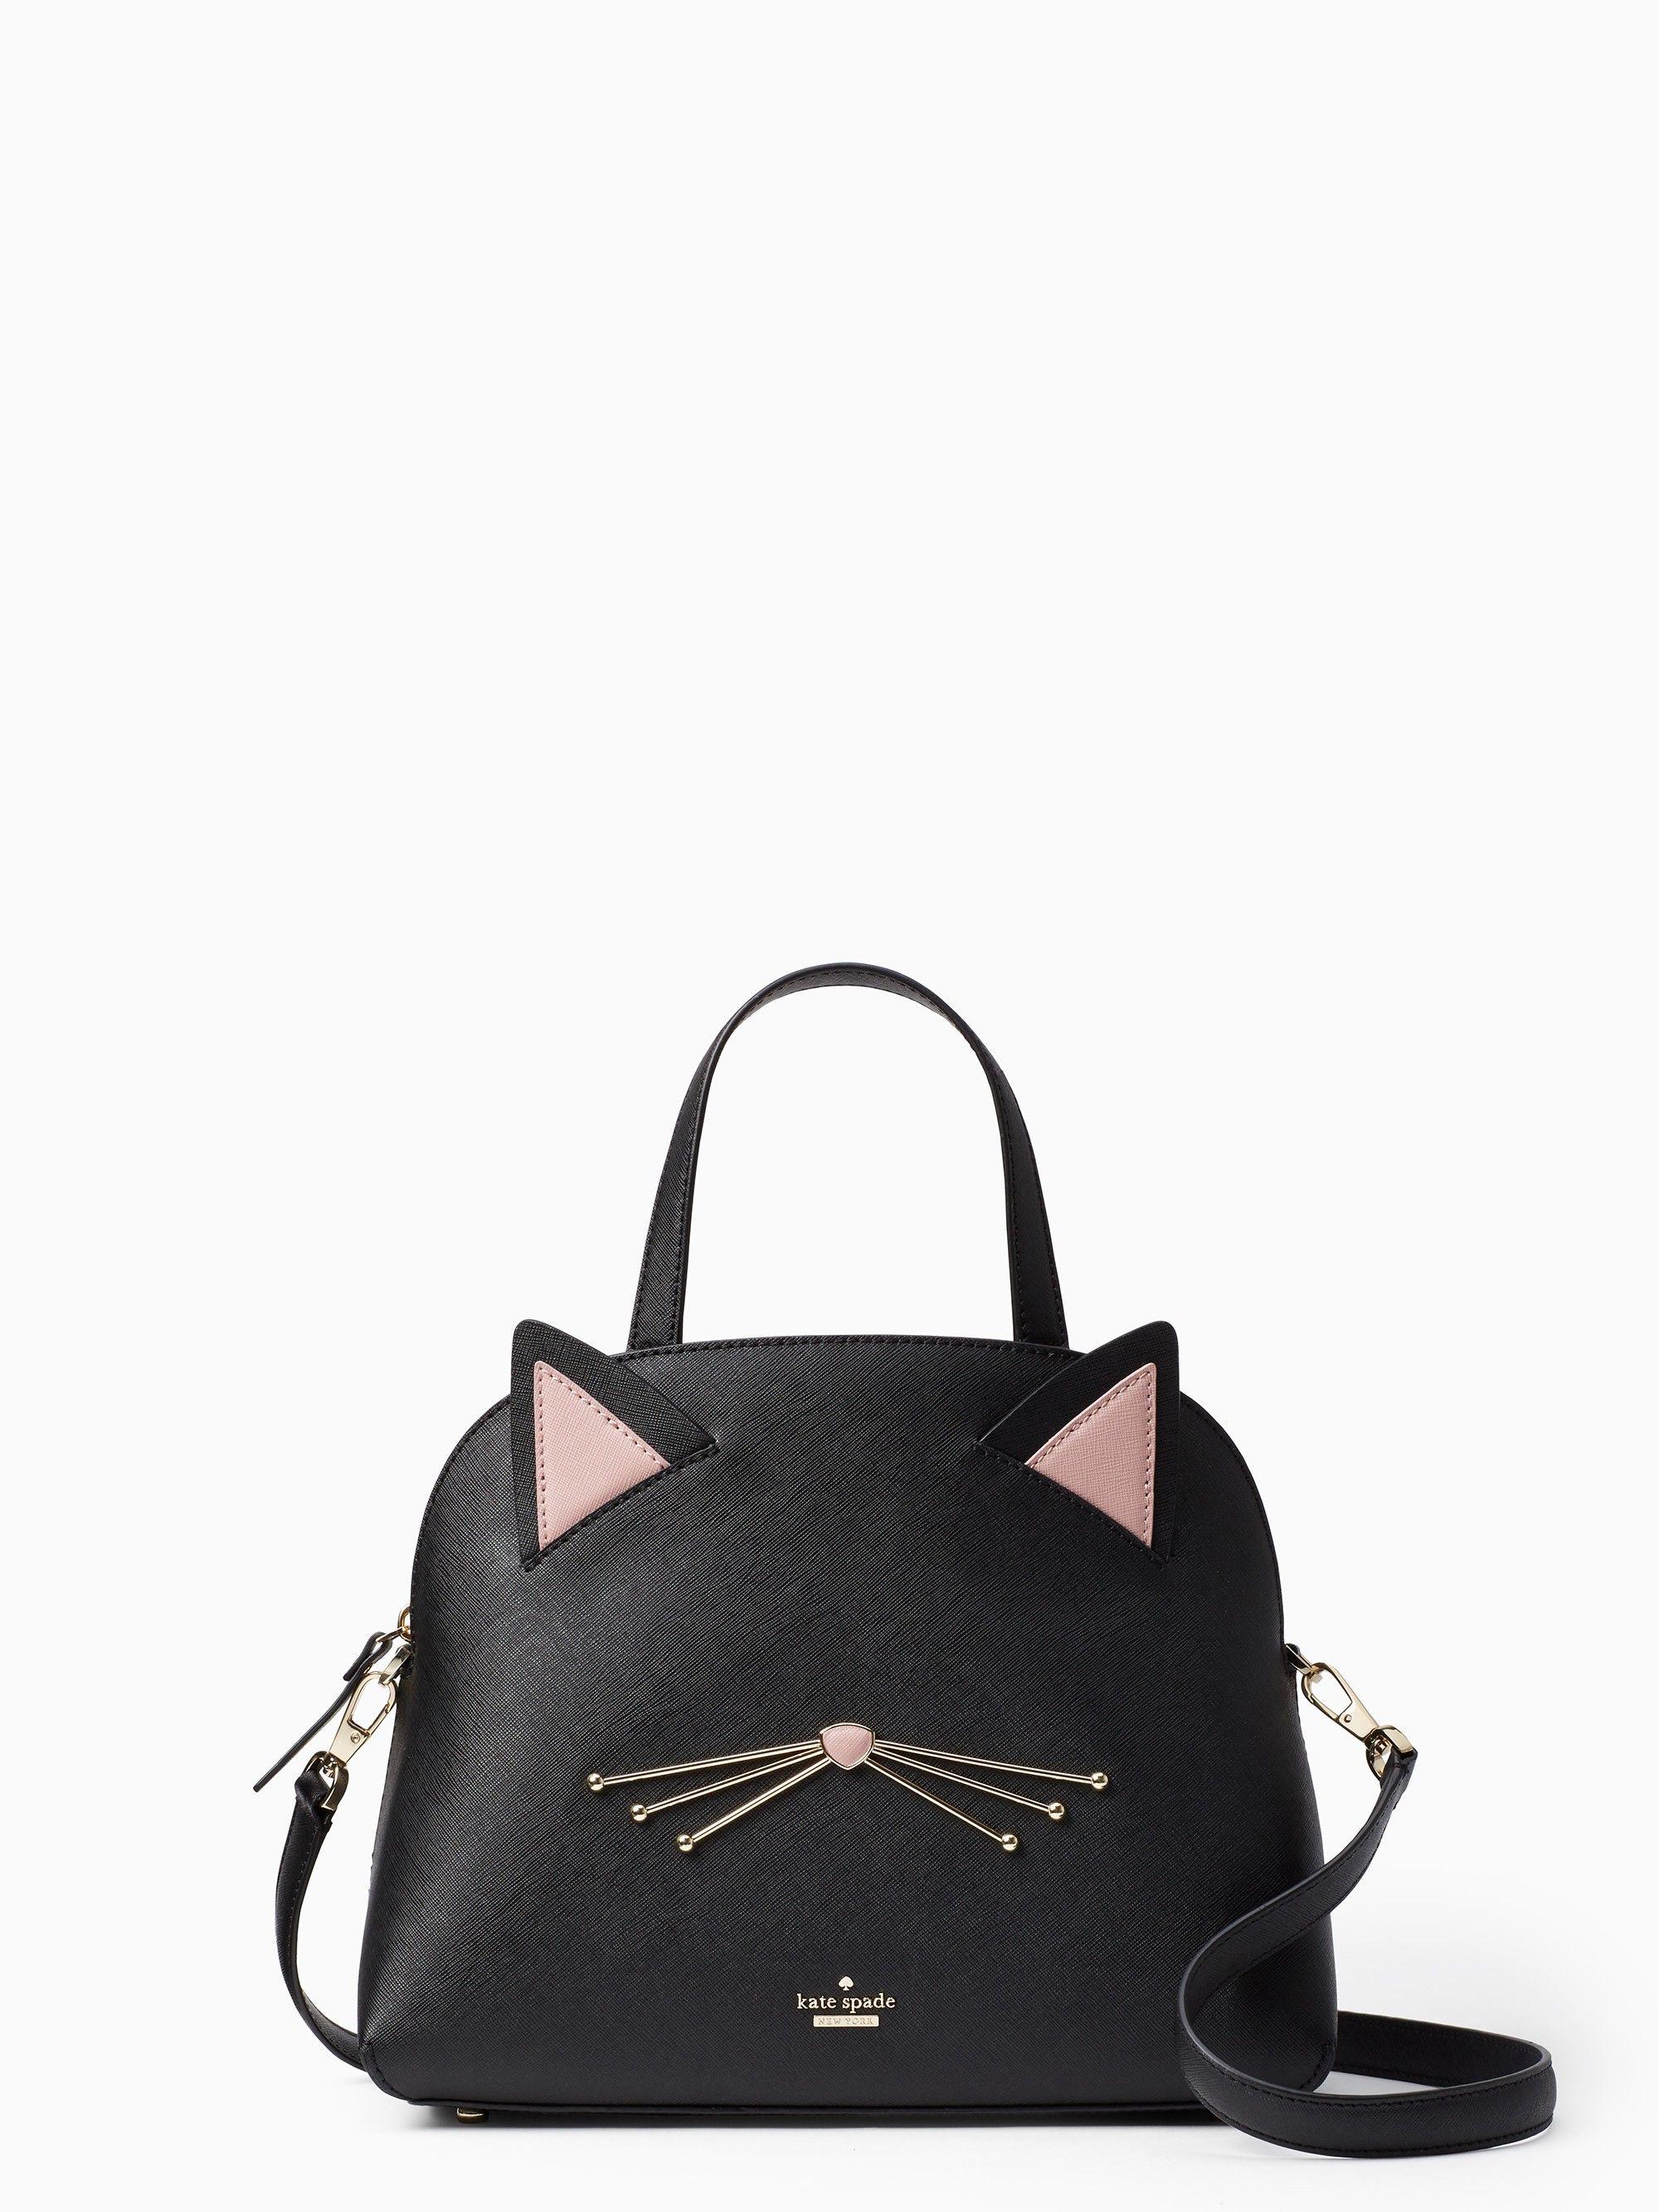 175c3465c21e KATE SPADE cat's meow cat lottie. #katespade #bags #shoulder bags #hand